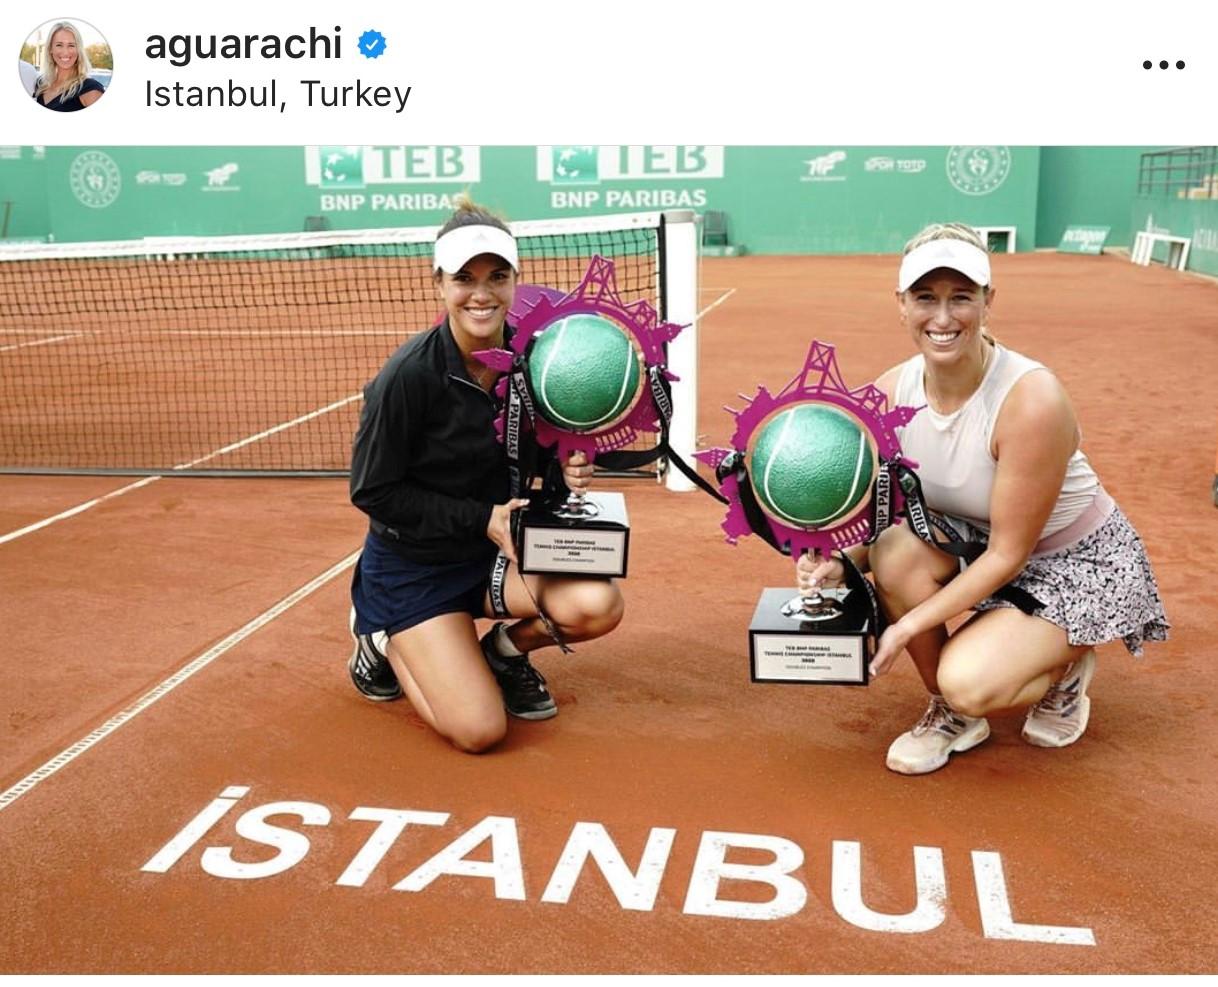 Alexa Guarachi WTA Istanbul